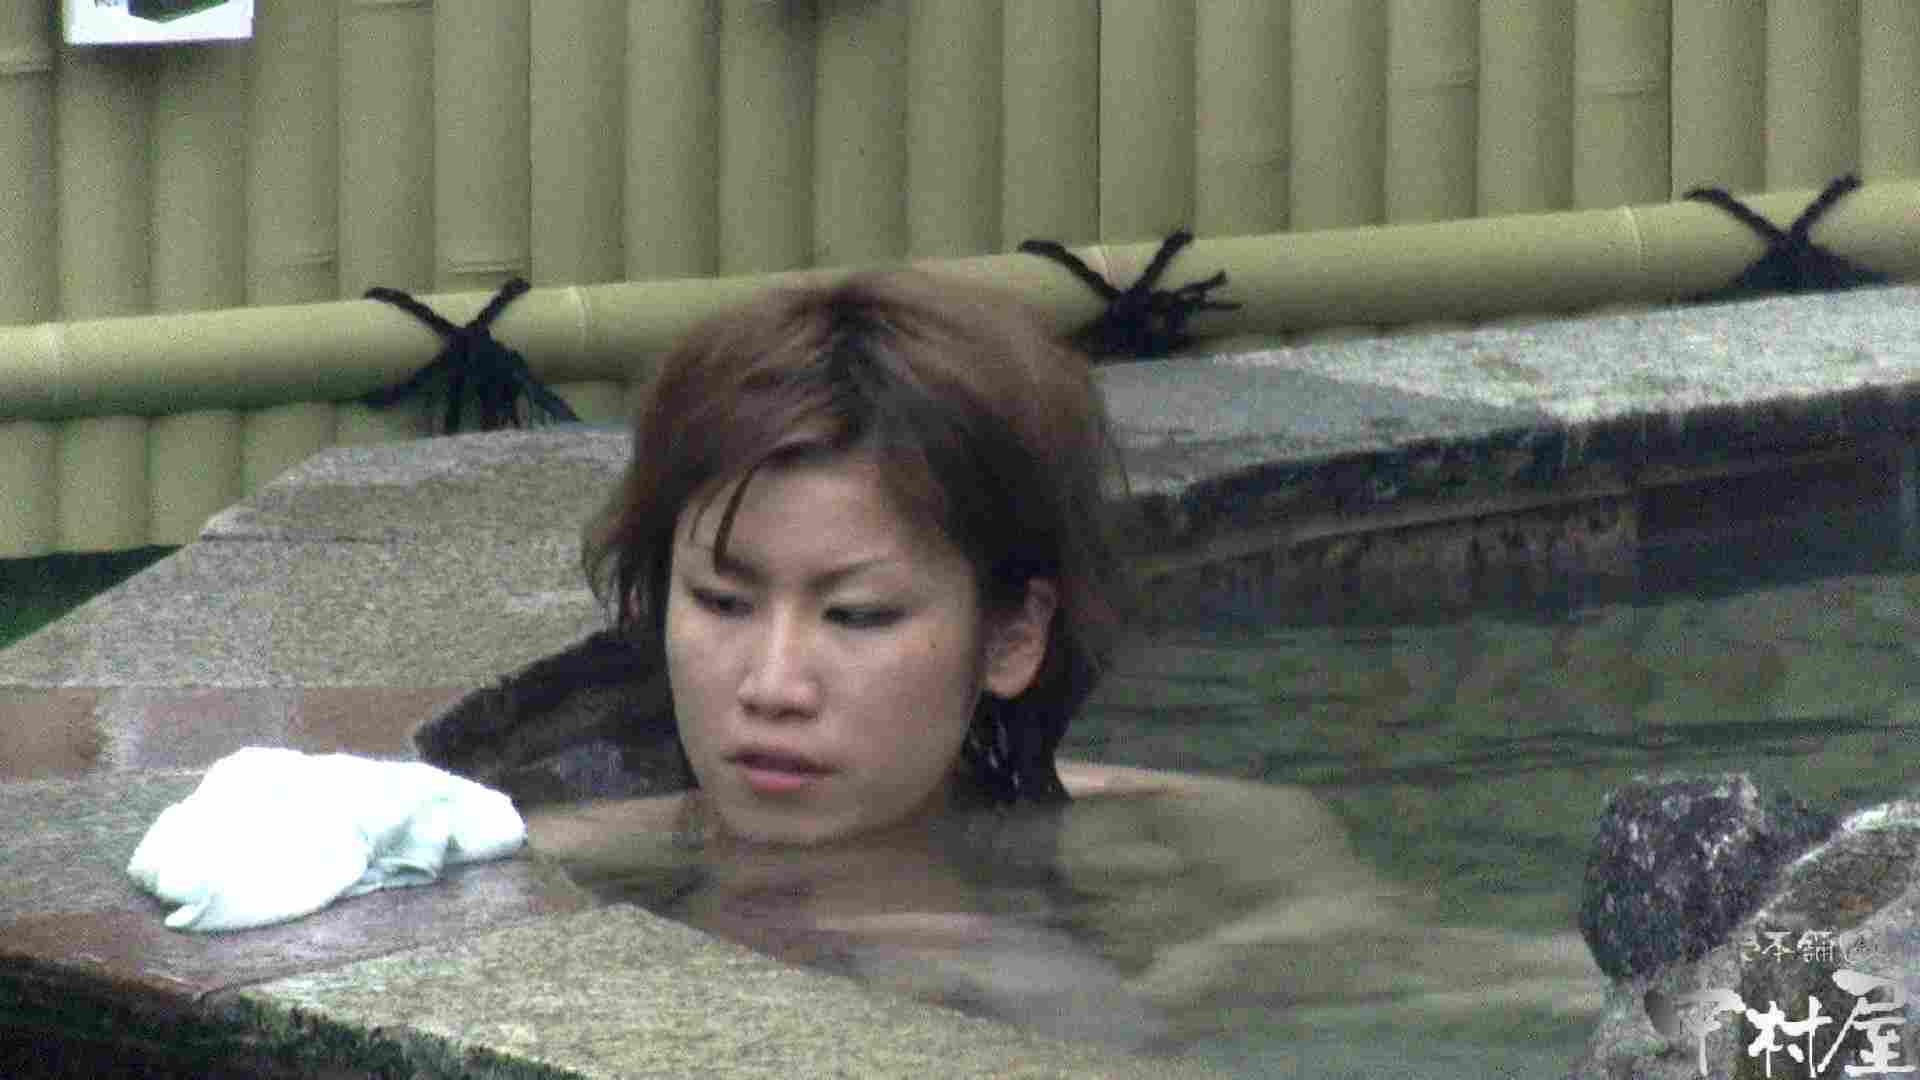 Aquaな露天風呂Vol.918 露天  54連発 44